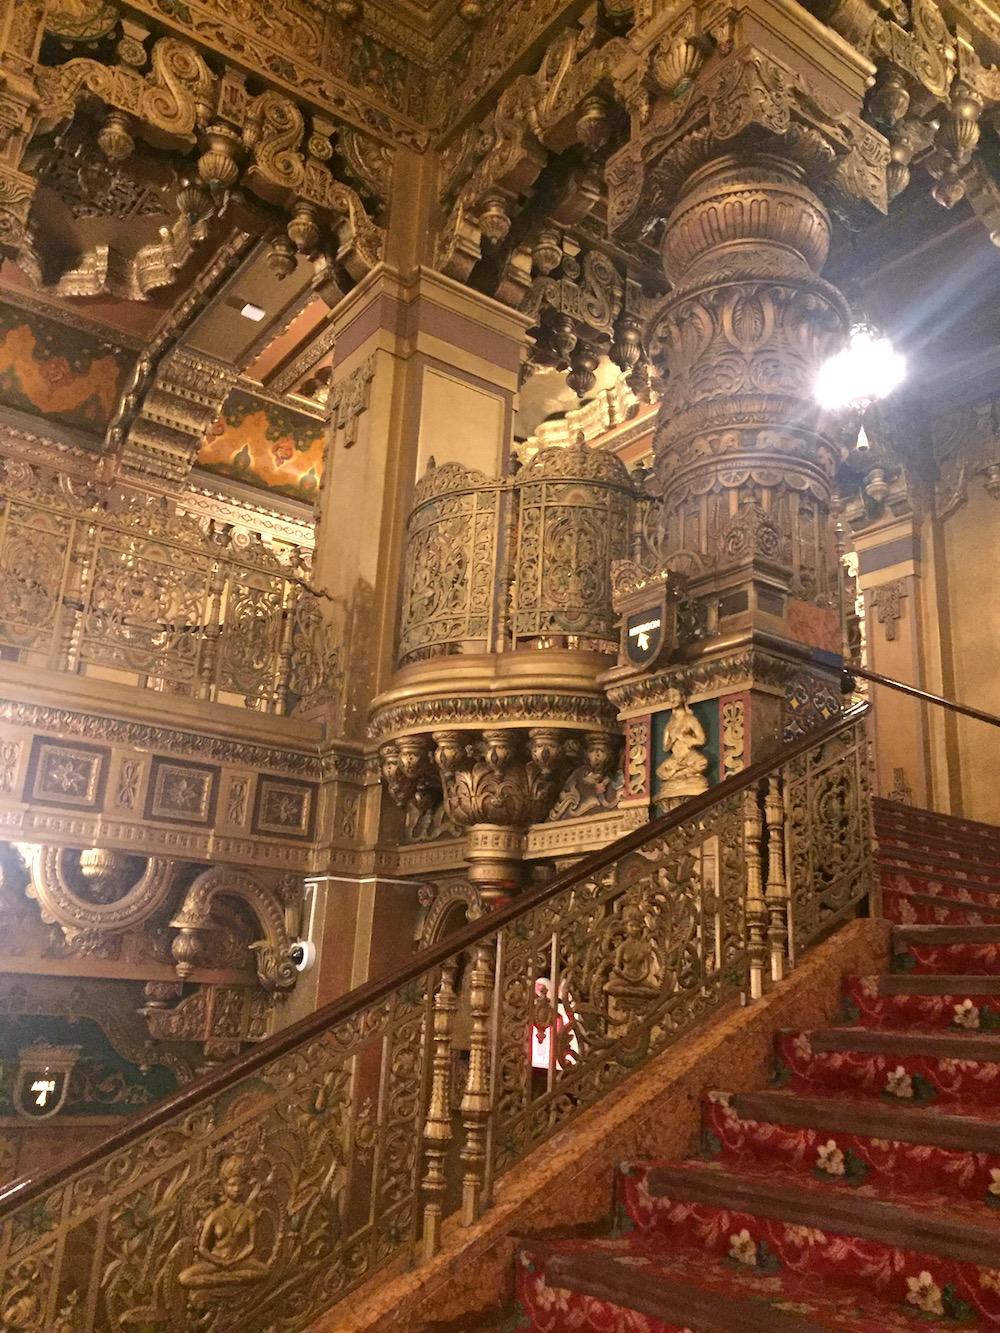 190212_Travelerose_United-Palace-Tour_Staircase.JPG